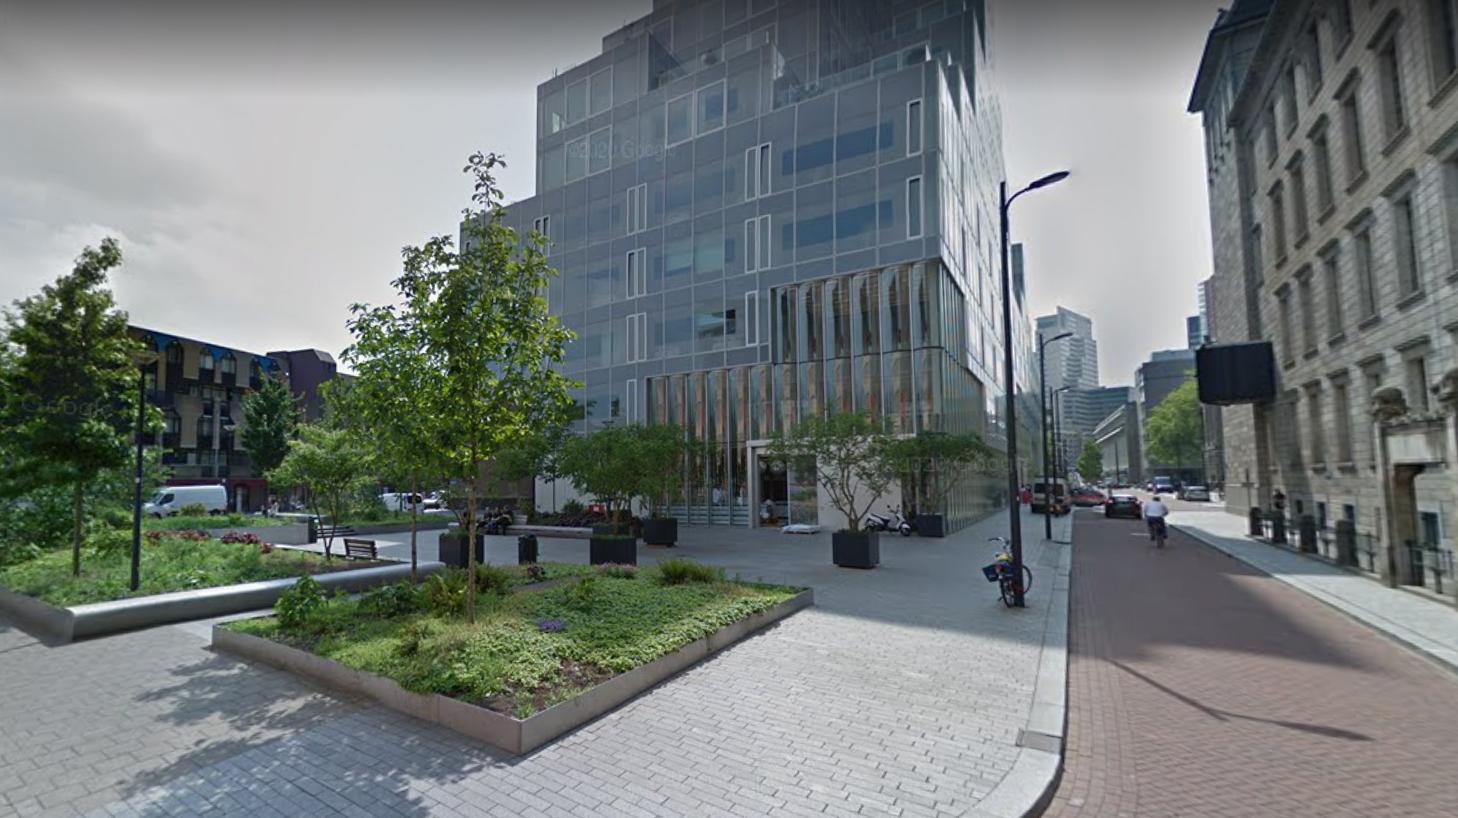 Raamplein Rotterdam